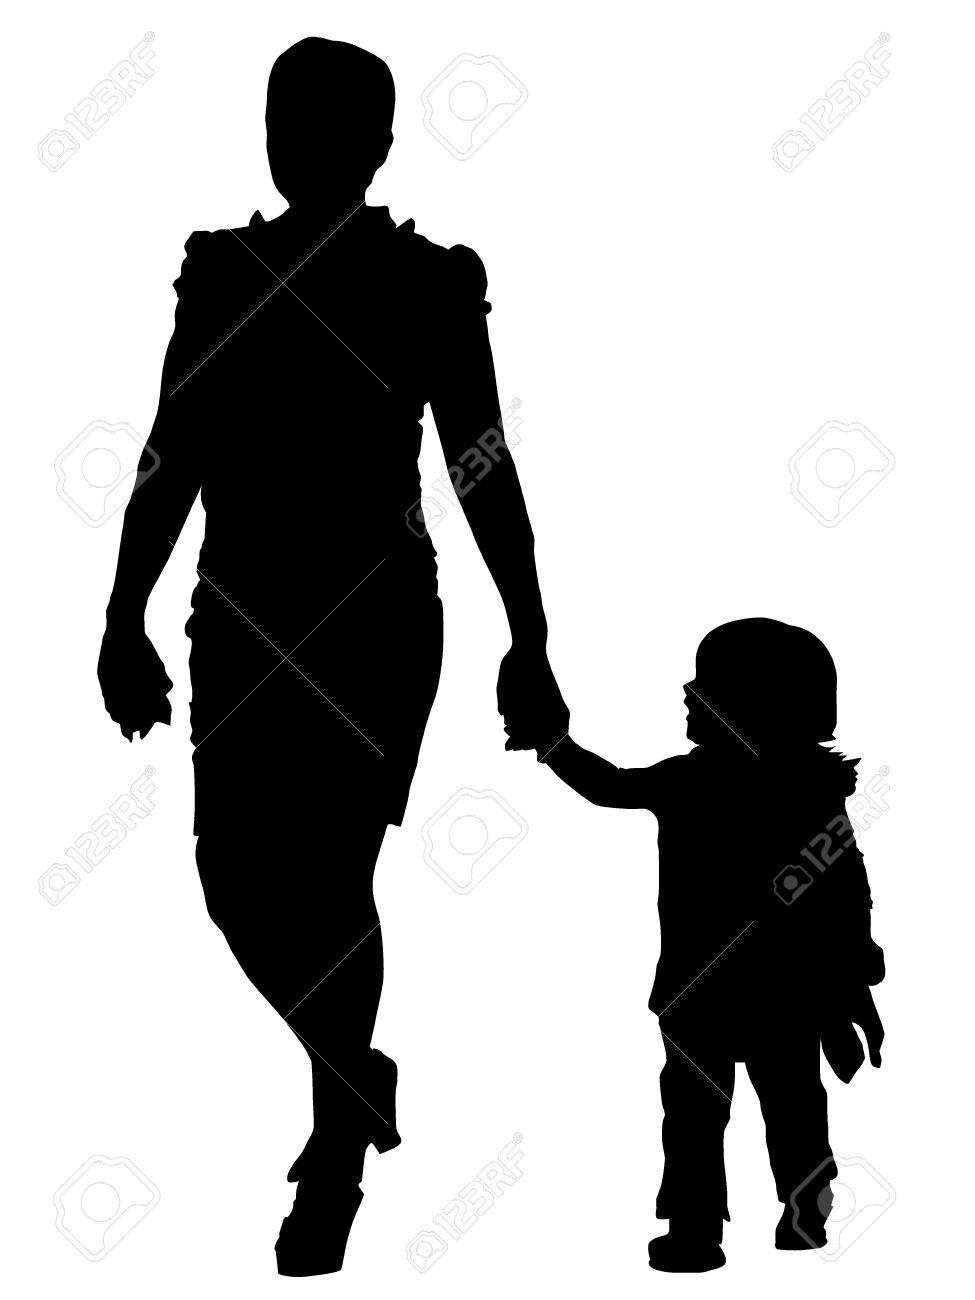 Child silhouette clip art. Children clipart shadow